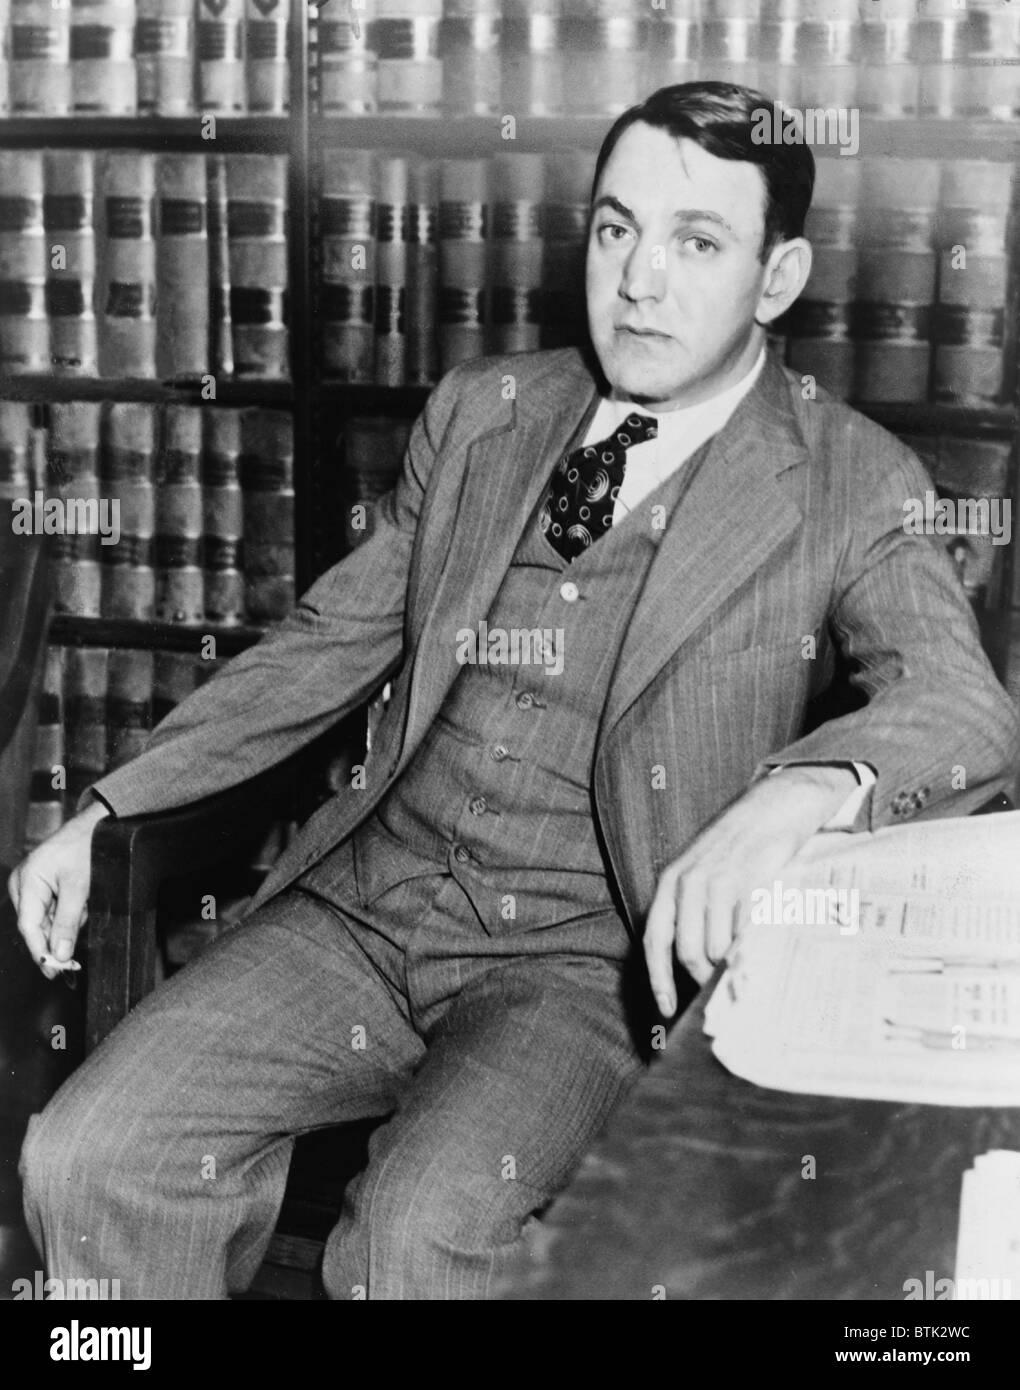 Dutch Schultz, born Arthur Flegenheimer (1902-1935), gangster and New York bootlegger was brought down by legal - Stock Image